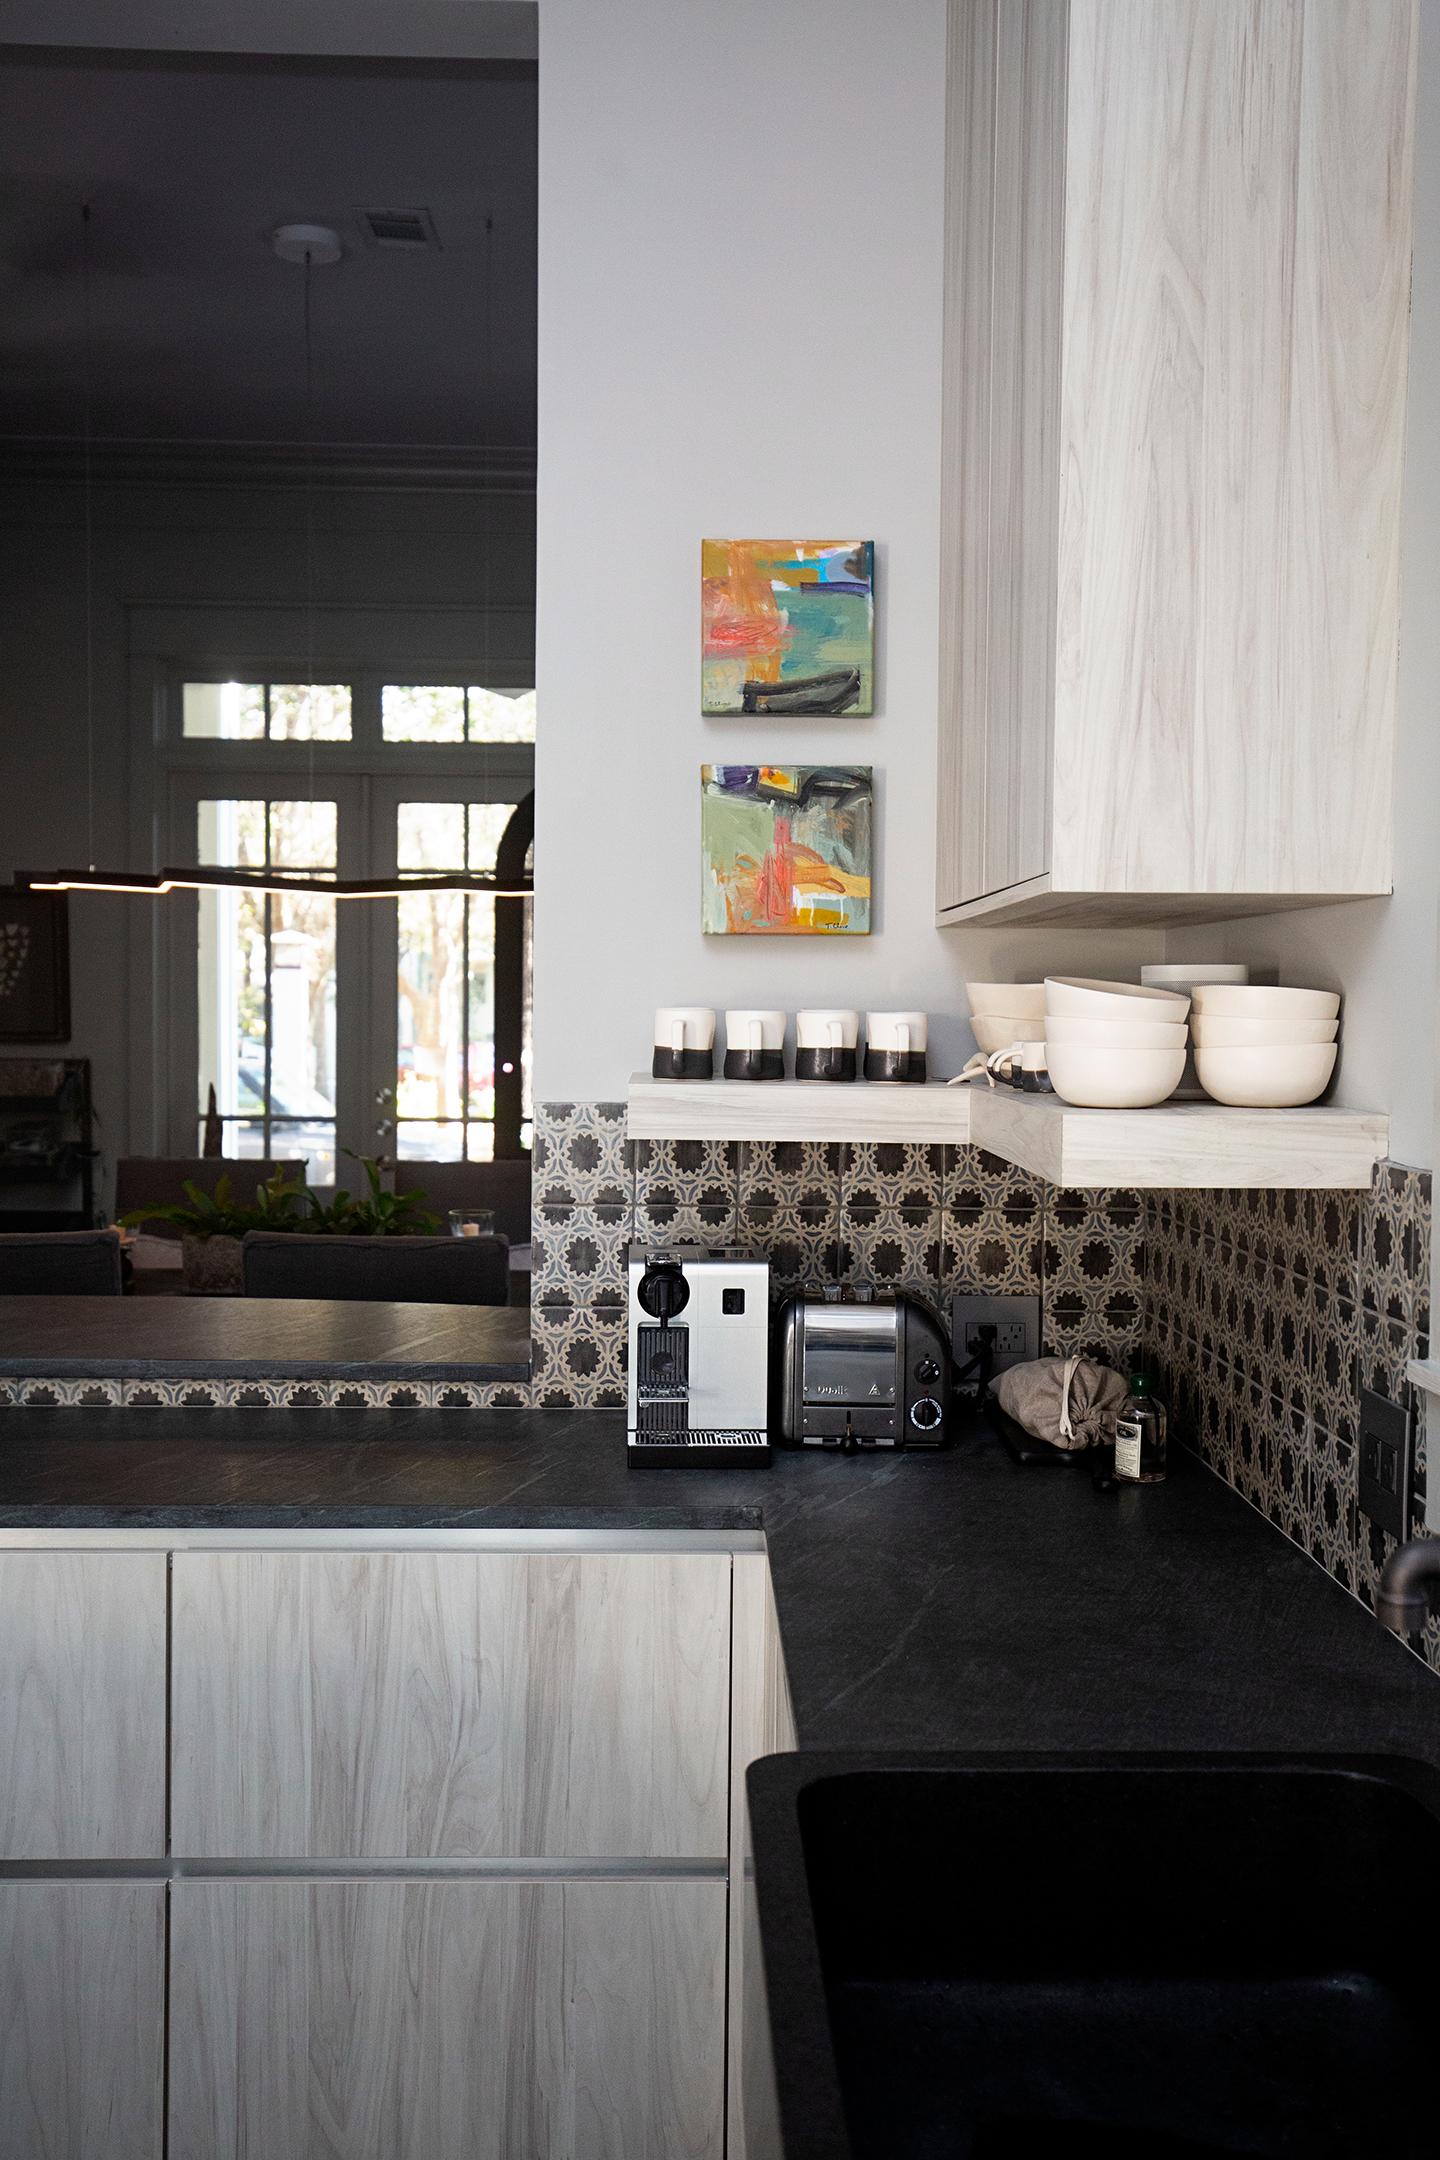 marquis-fine-cabinetry-milano-kitchen-remodel